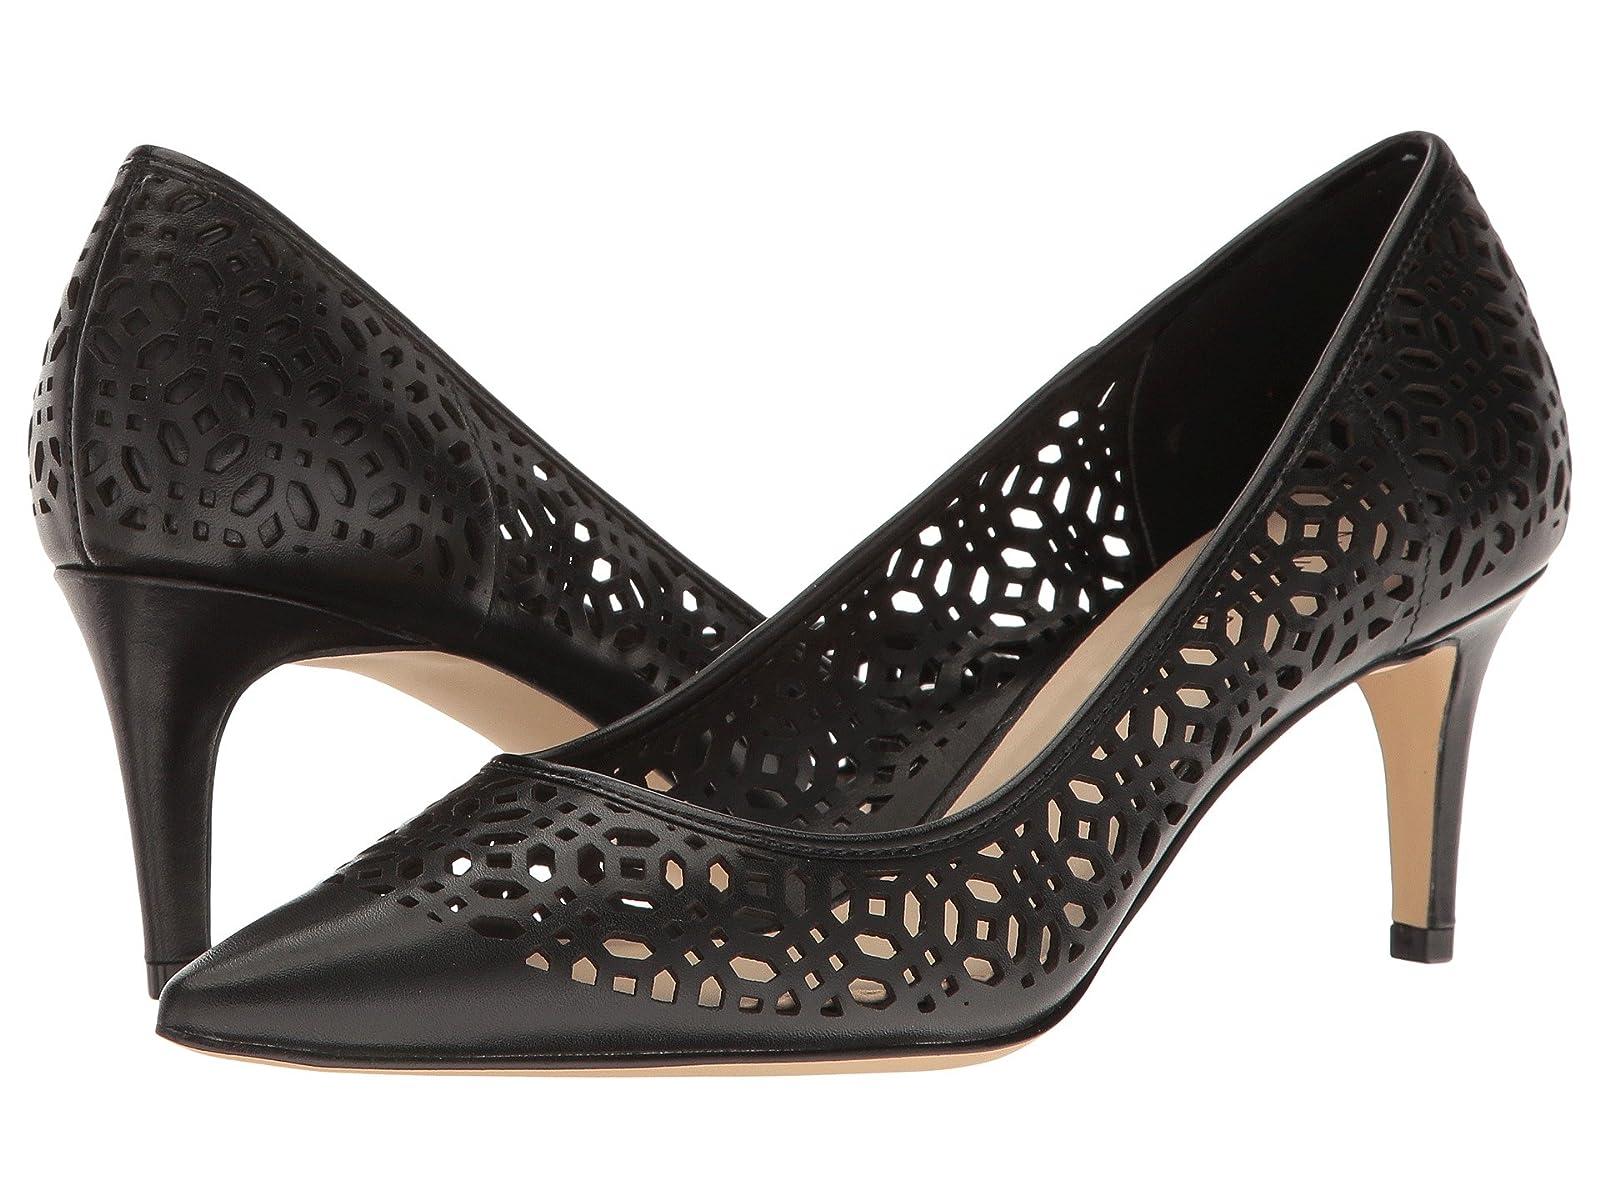 Nine West ShavarCheap and distinctive eye-catching shoes